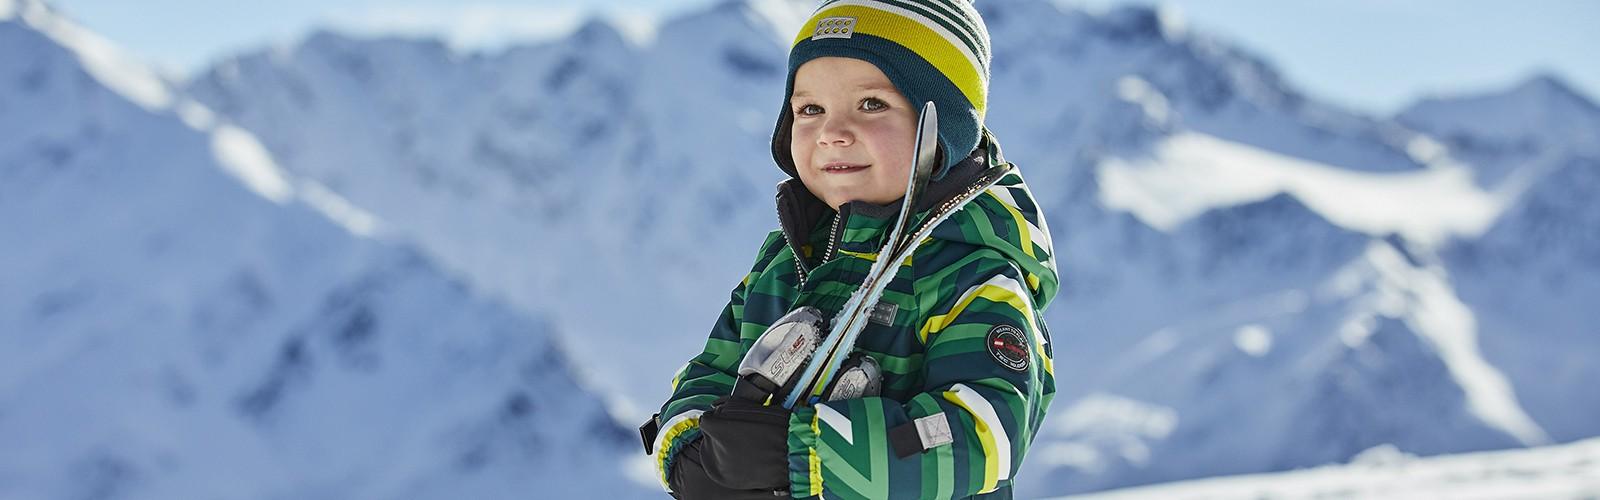 Pour skier (2-10 ans)